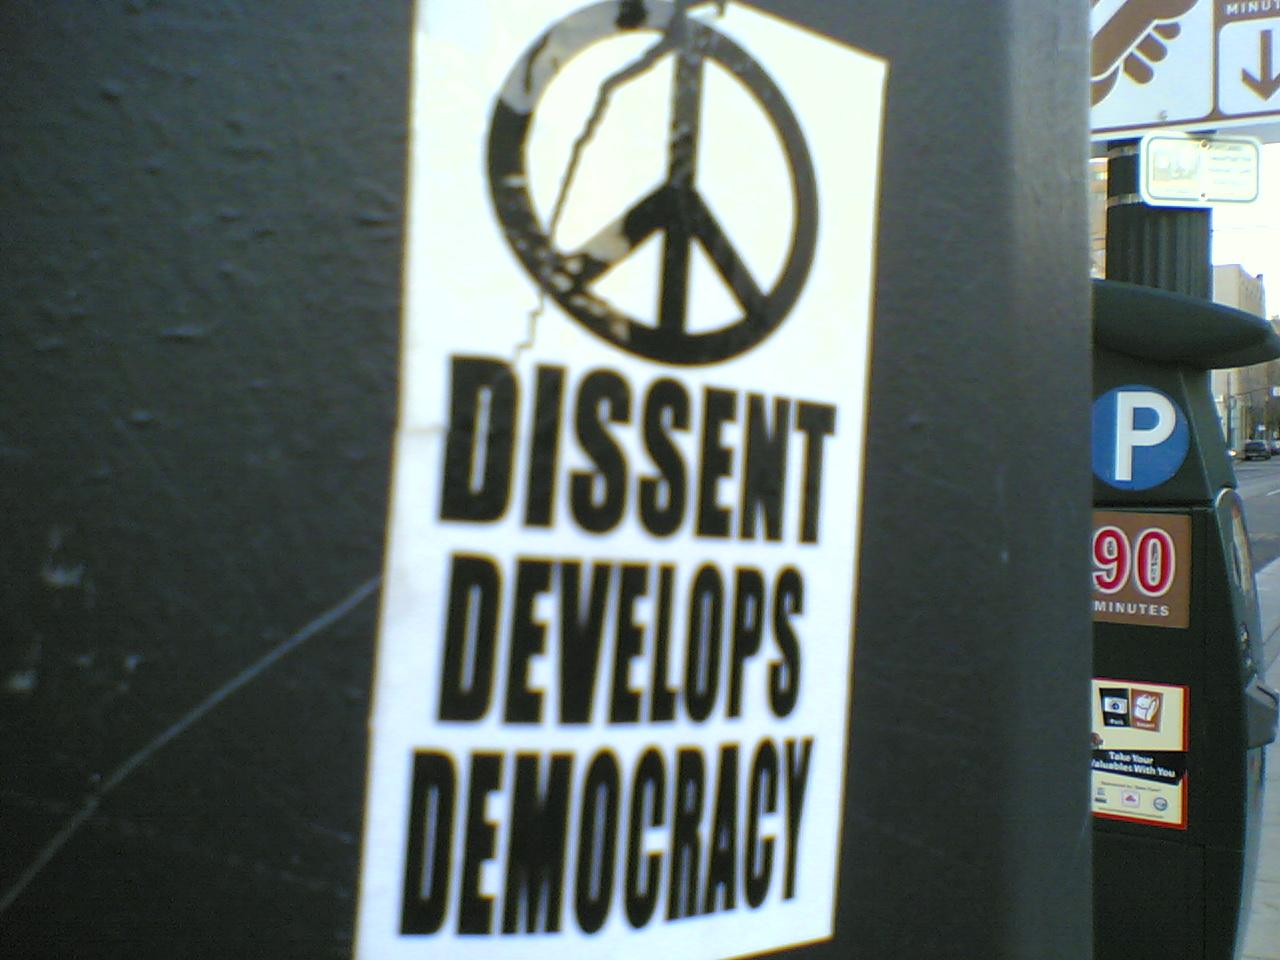 Dissent - Wikipedia